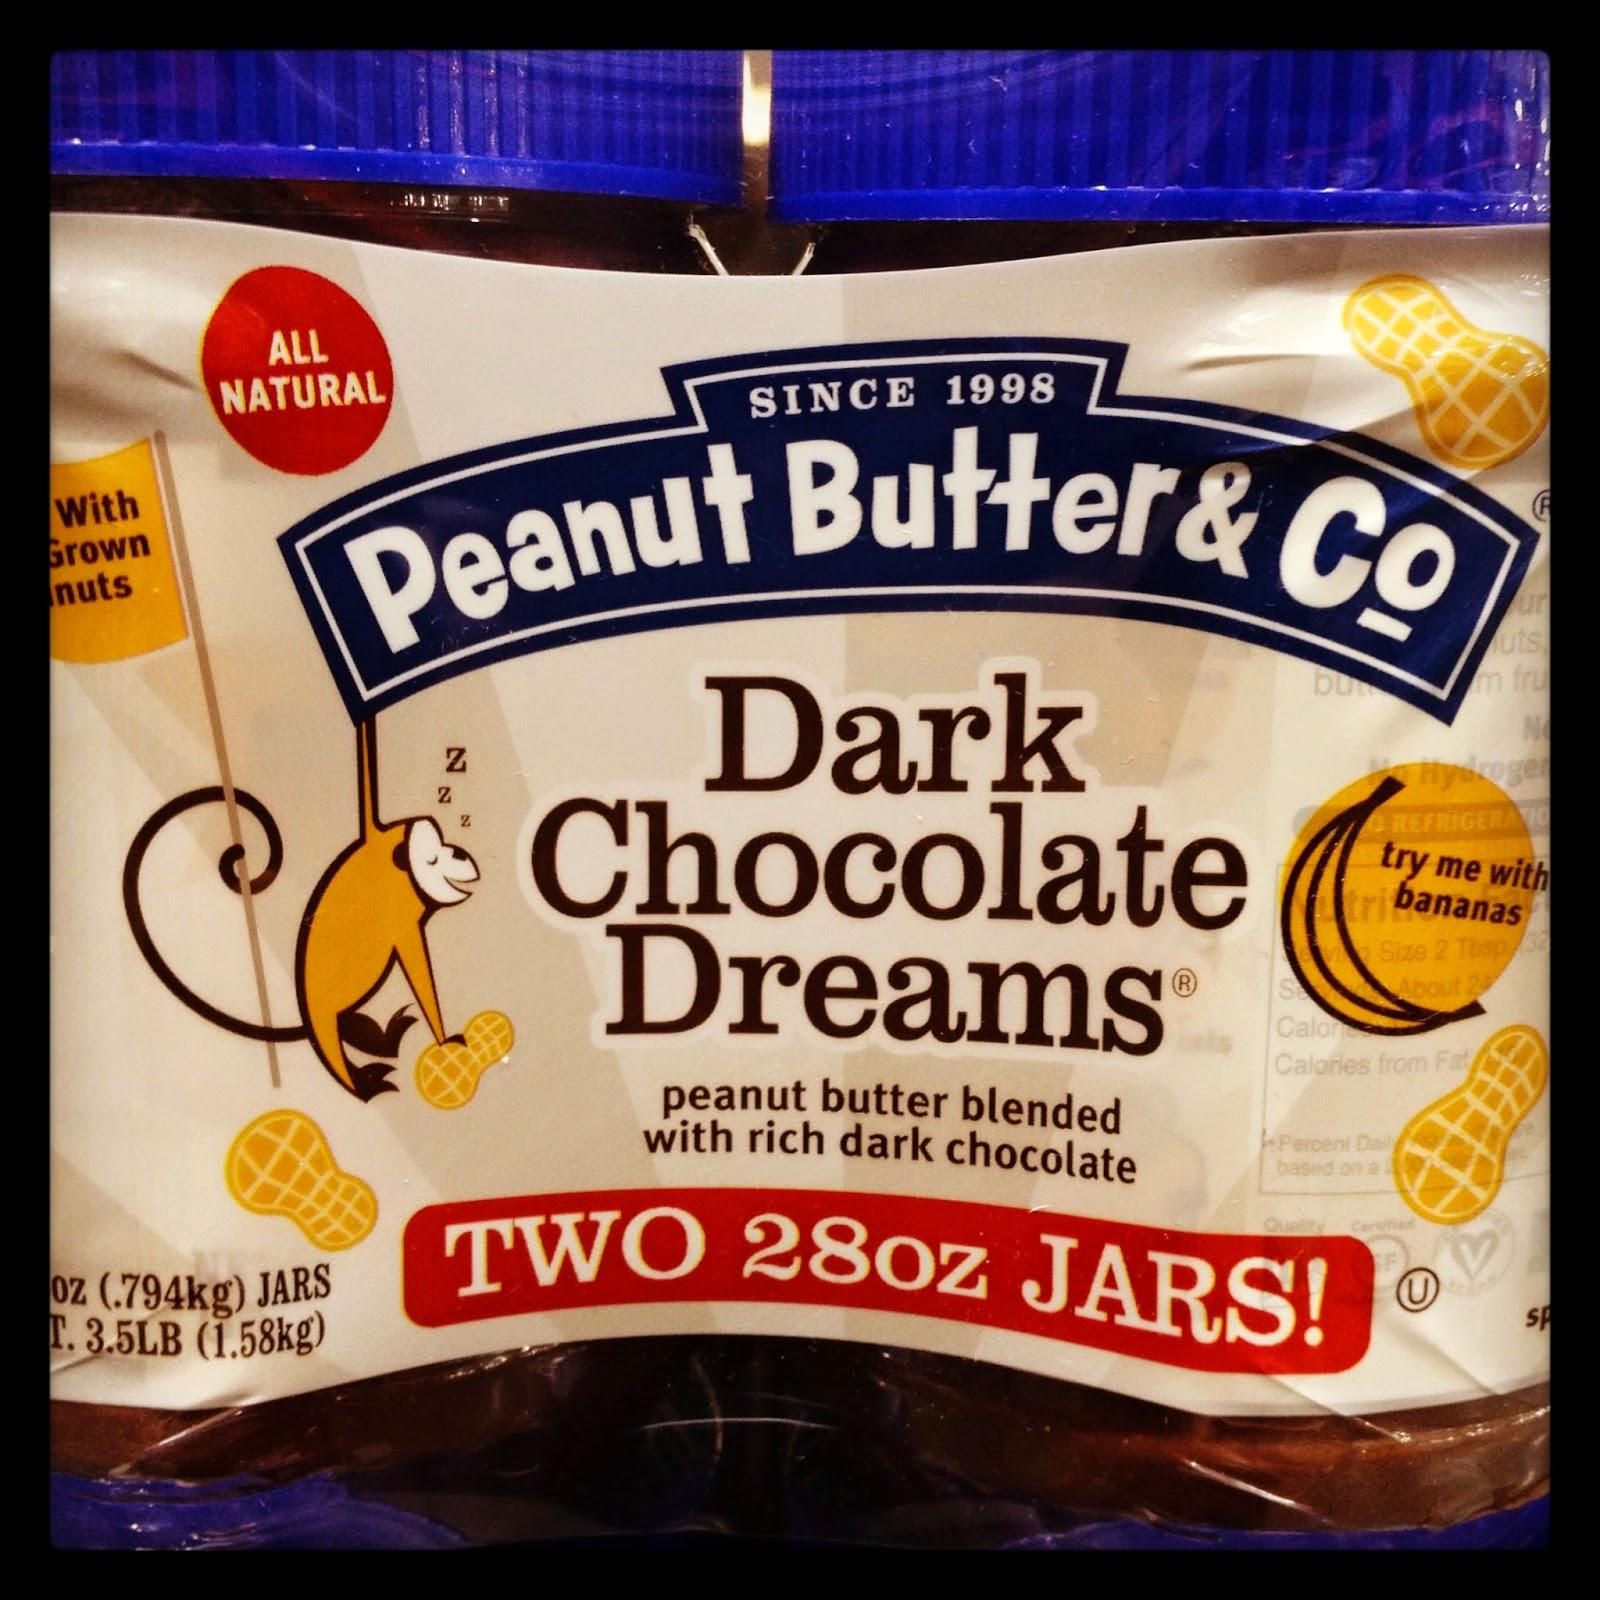 Vegan Dark Chocolate Dreams Peanut Butter Vegetarian Costco